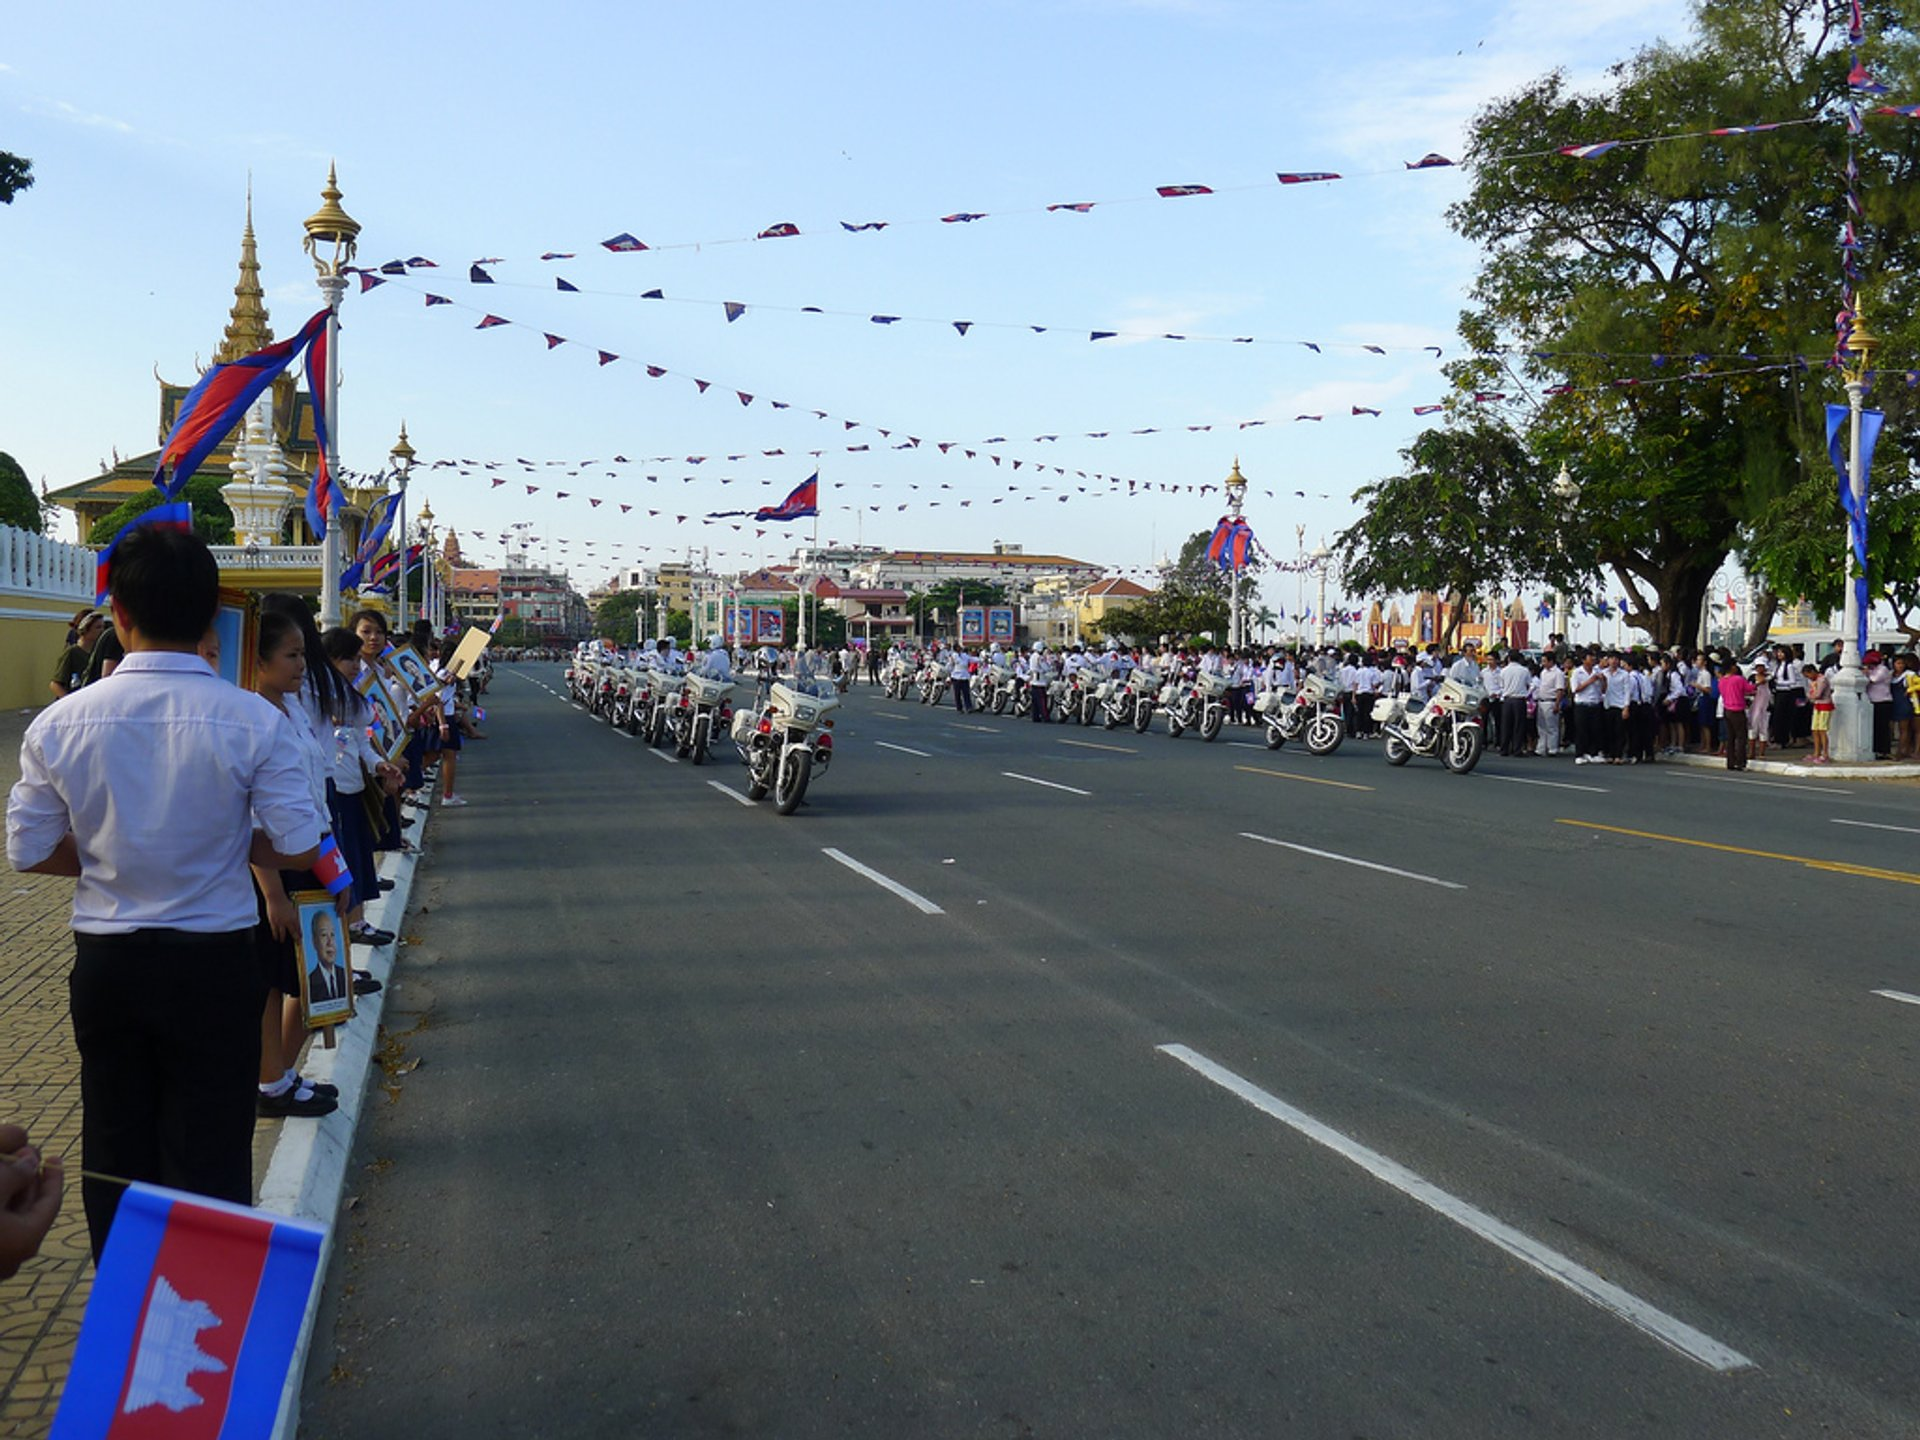 King's Birthday Celebration in Cambodia 2020 - Best Time